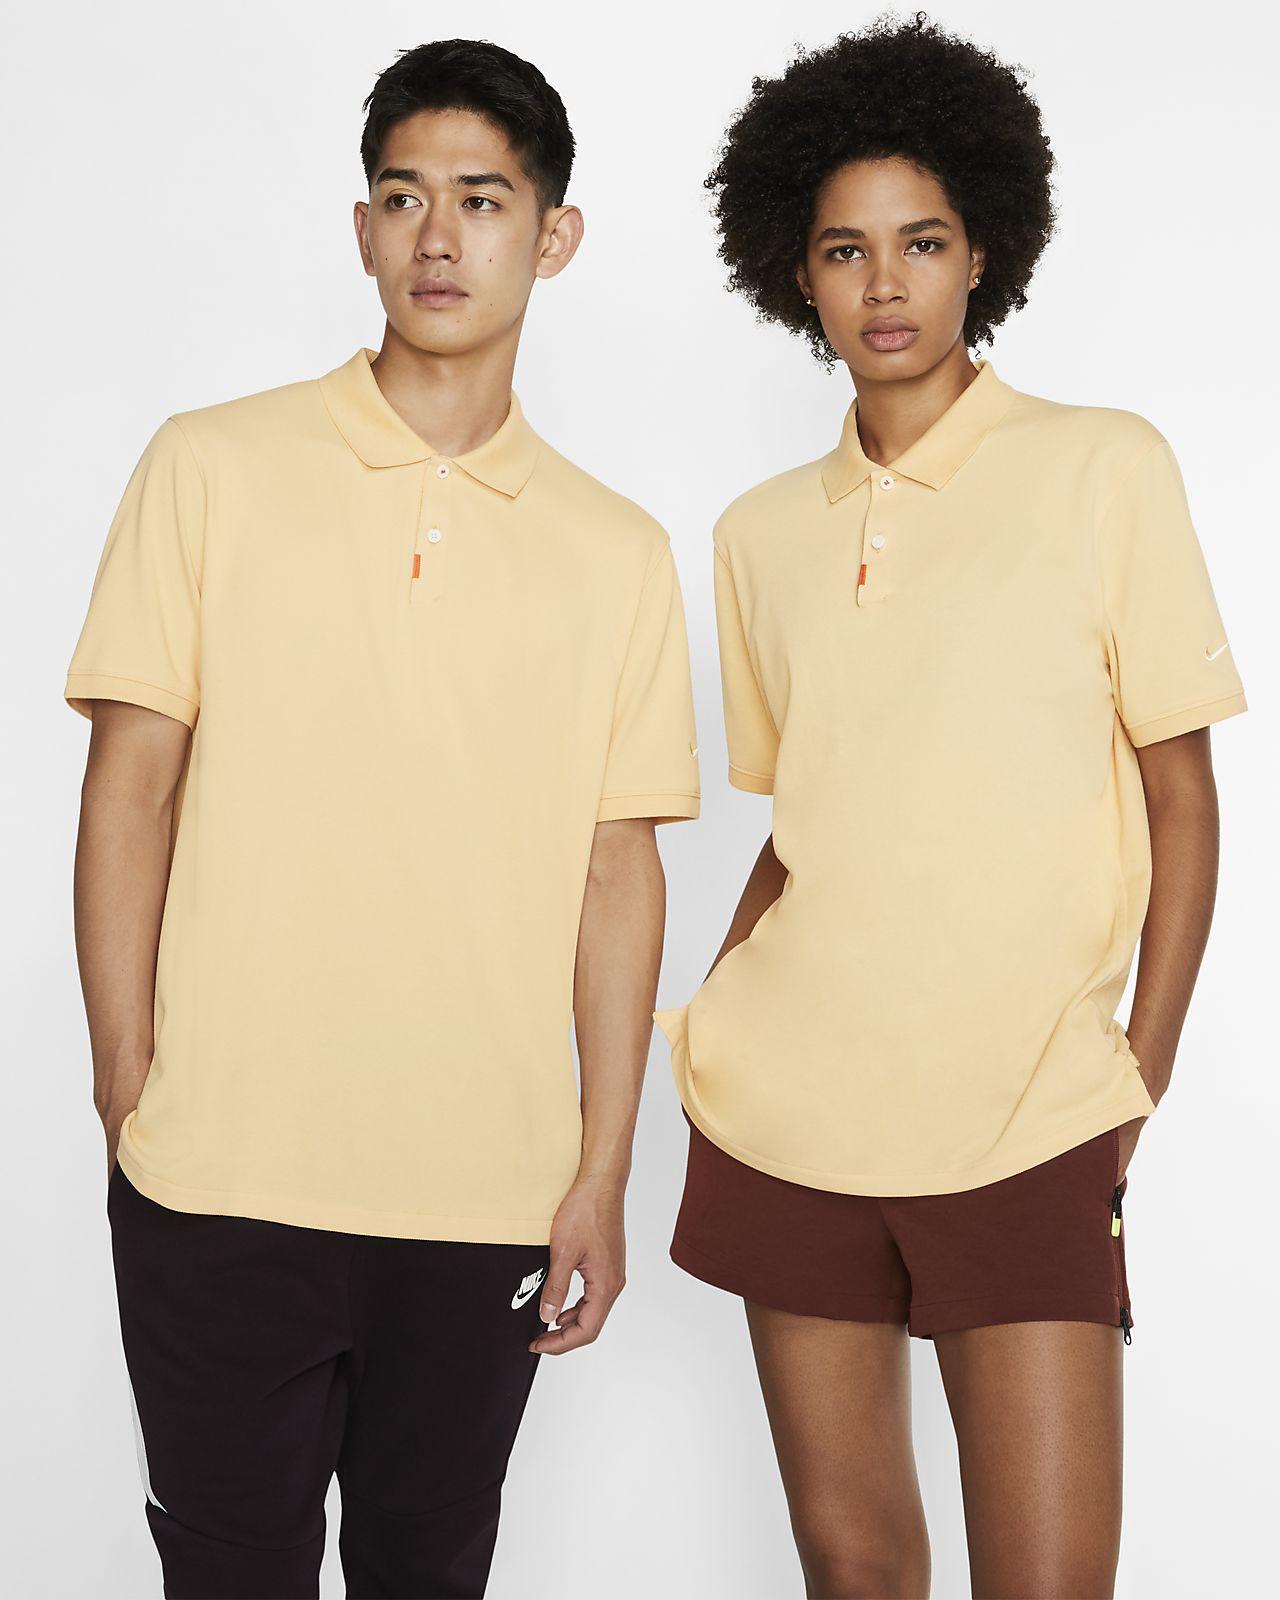 The Nike Polo男子修身版型翻领T恤